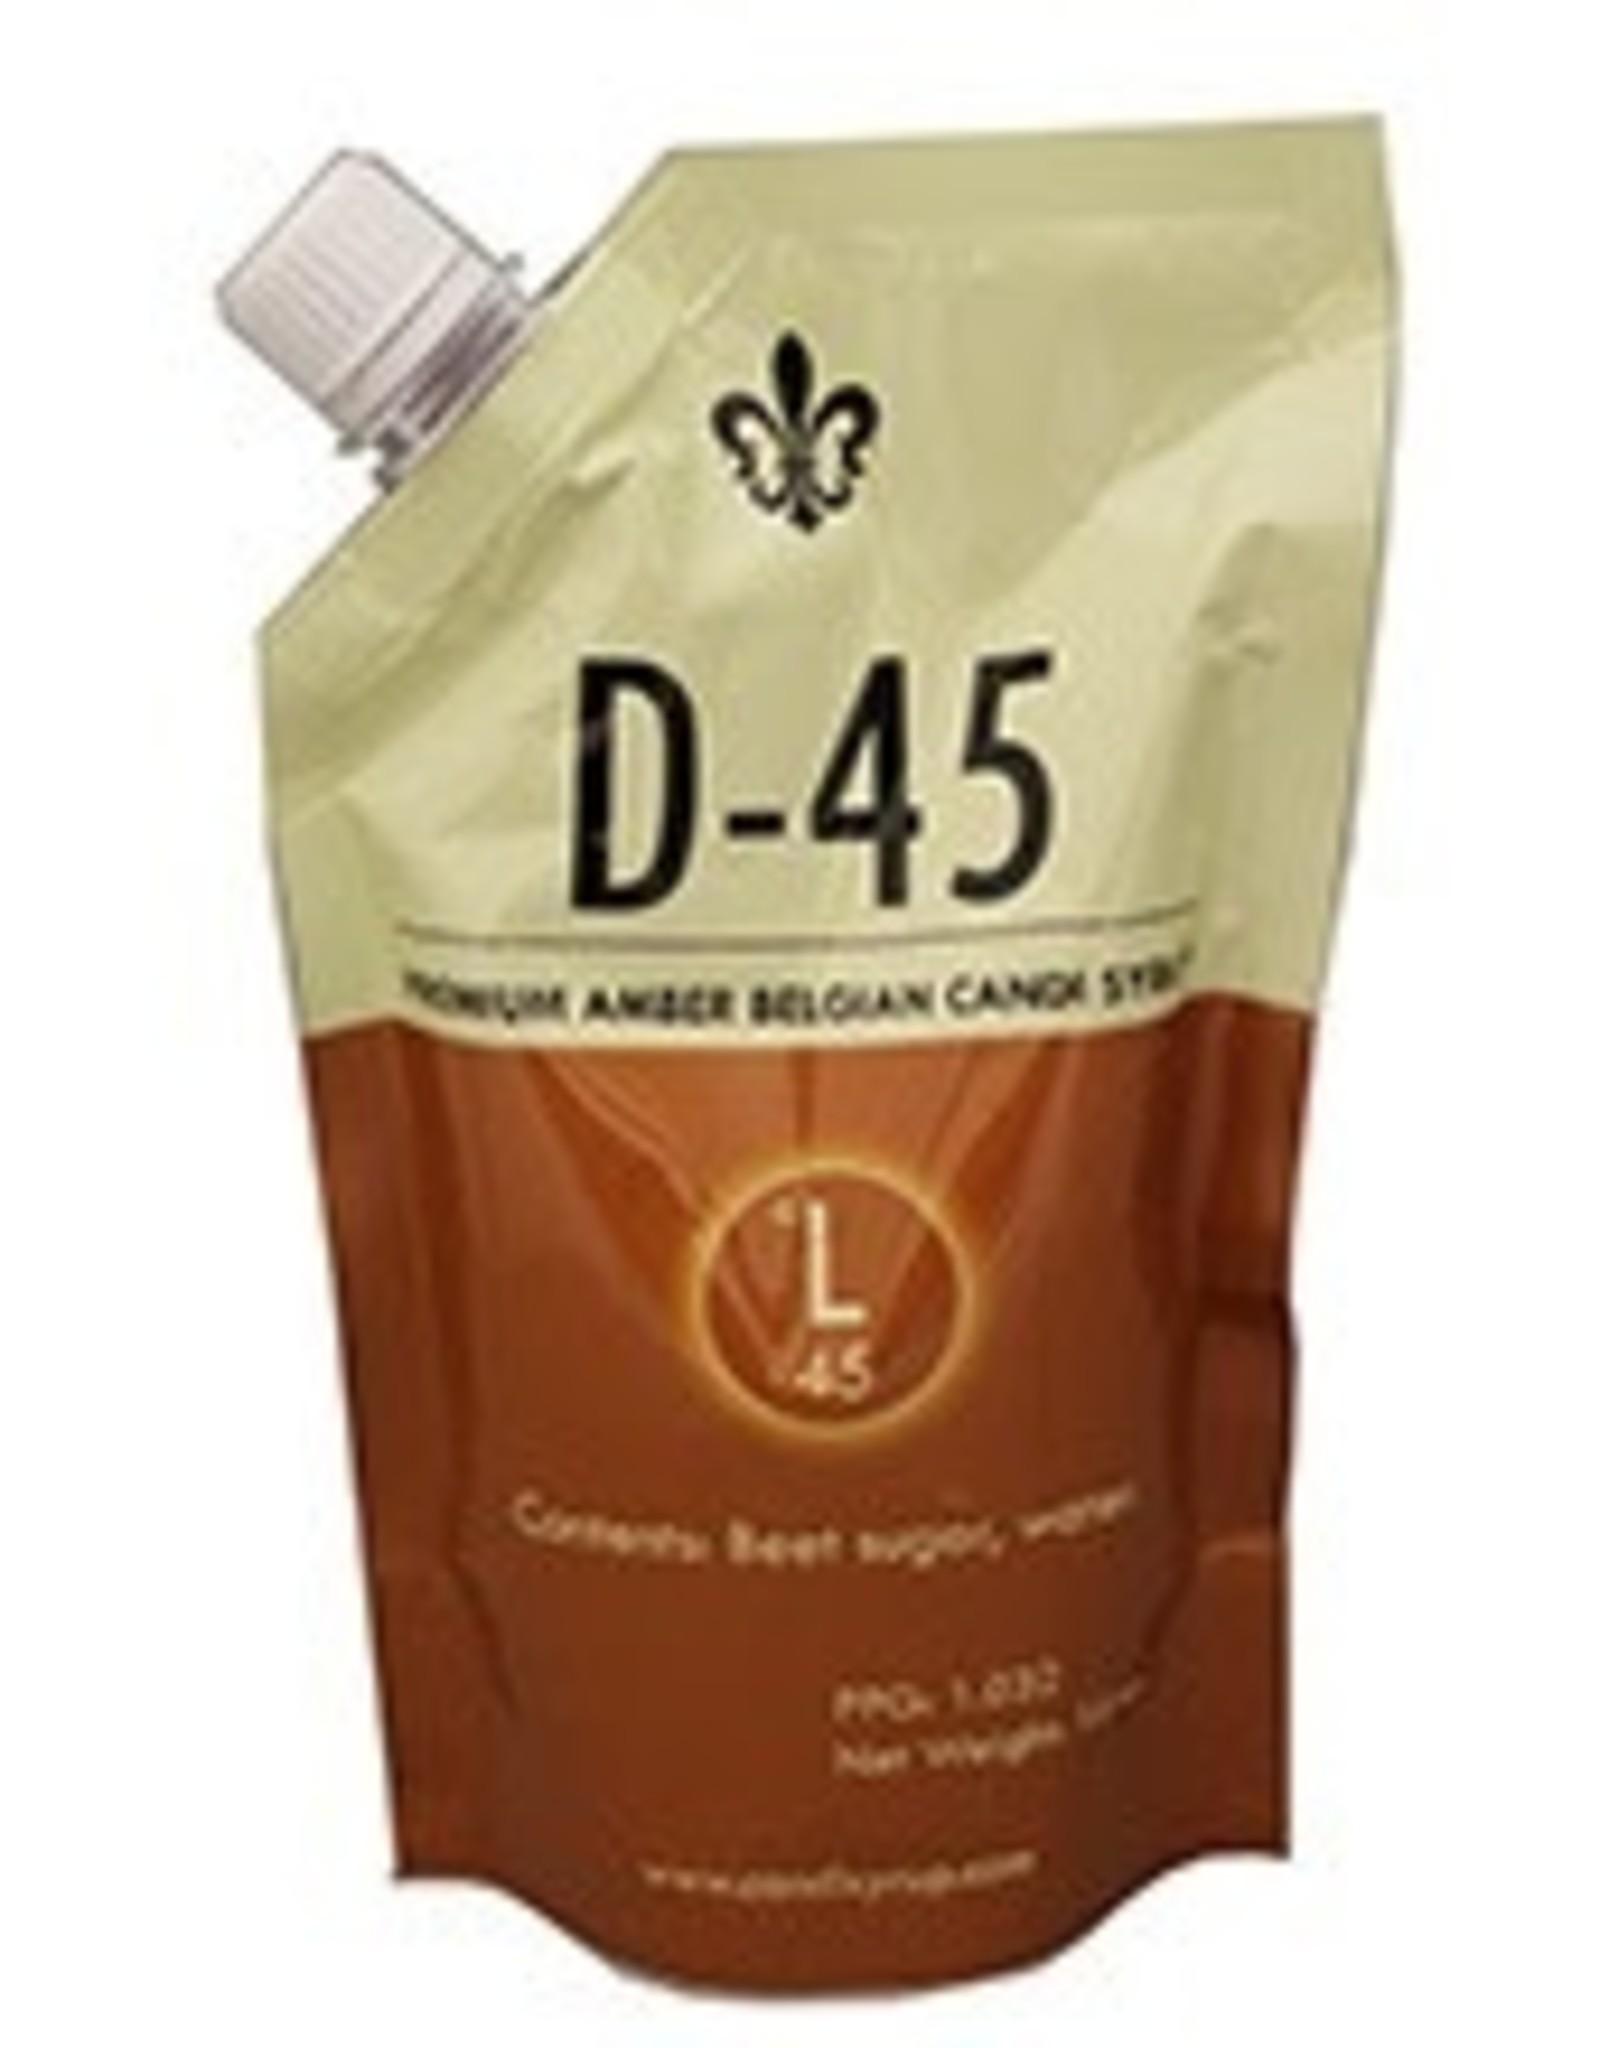 Candi Syrup - D45 Belgian 1 lb